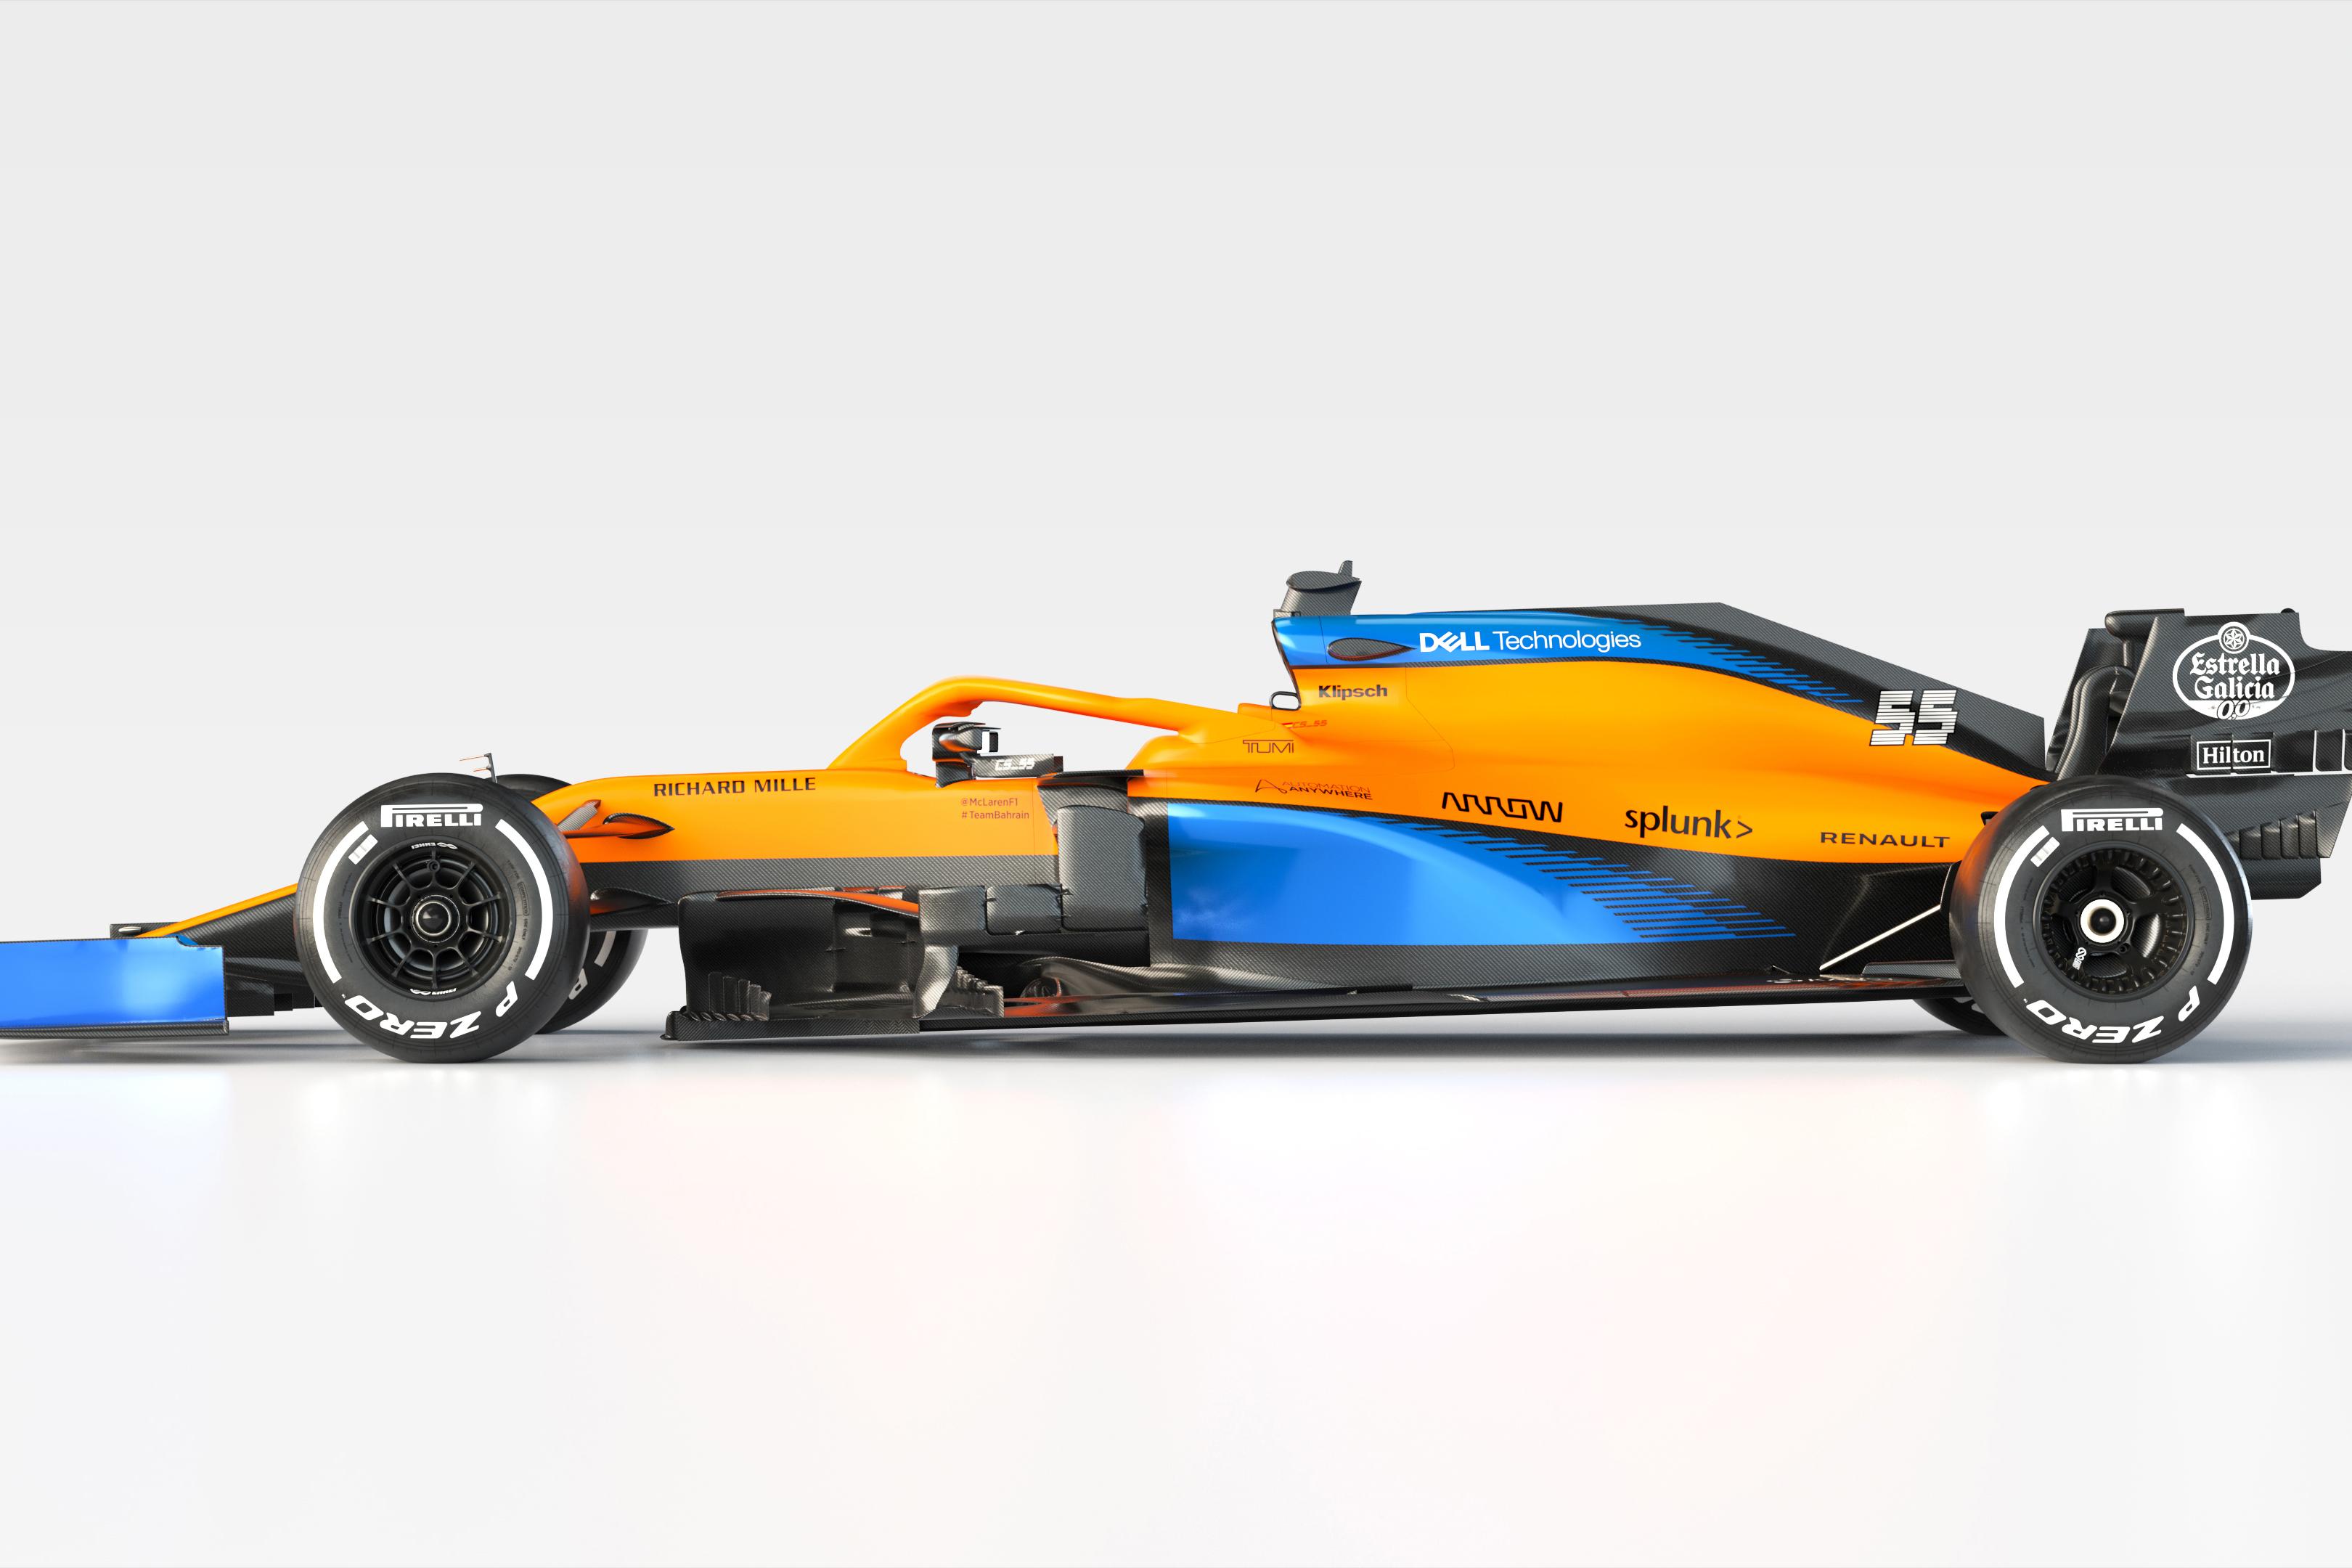 2020 Mcl35 Carlos Sainz Side Unbranded